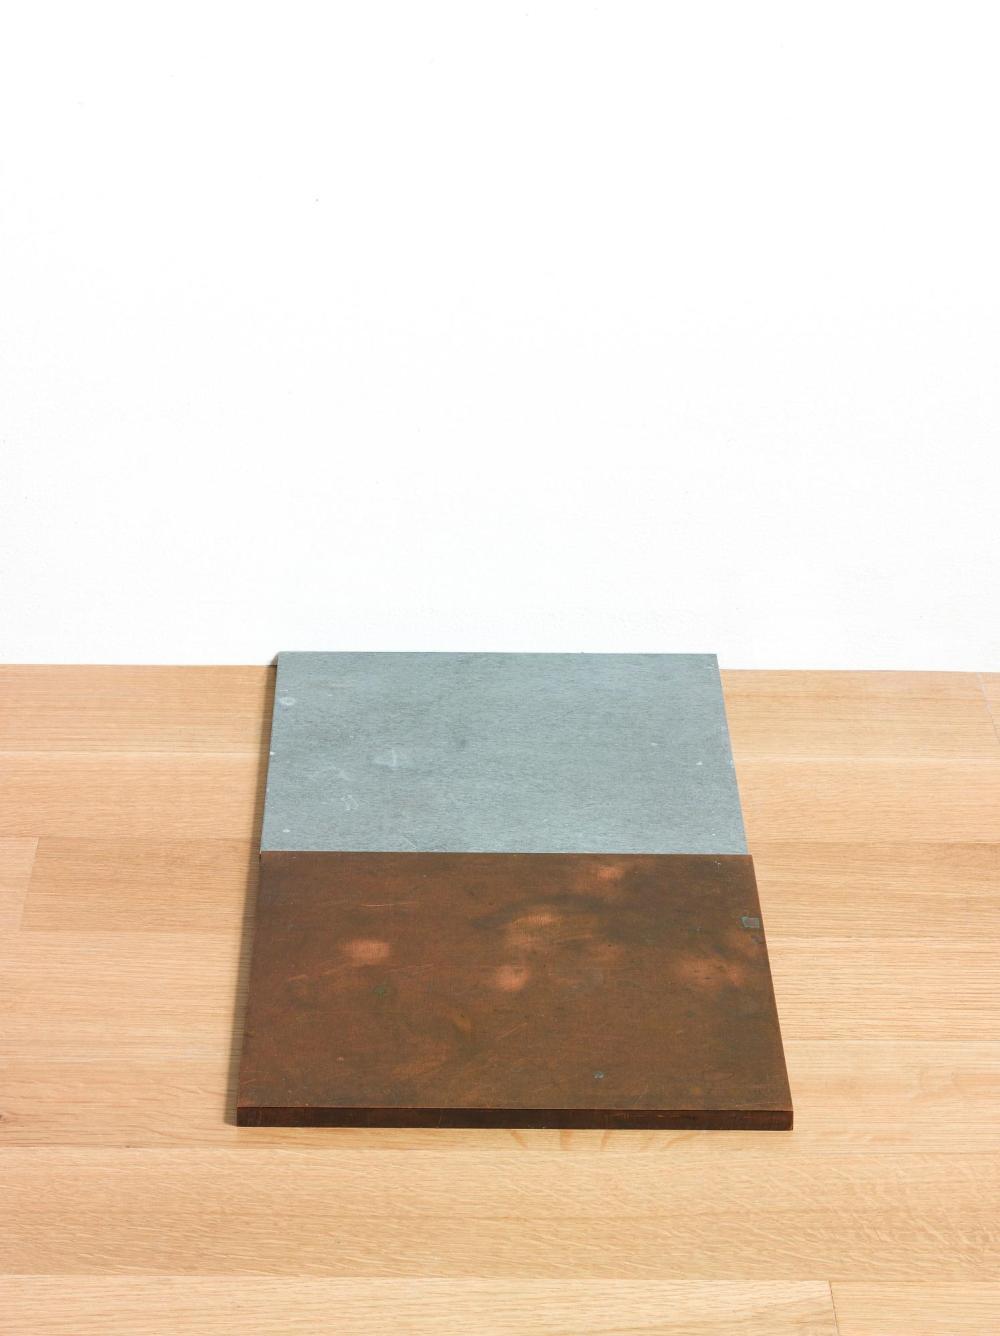 CARL ANDRE (B. 1935) | Voltaglyph 2, 1997